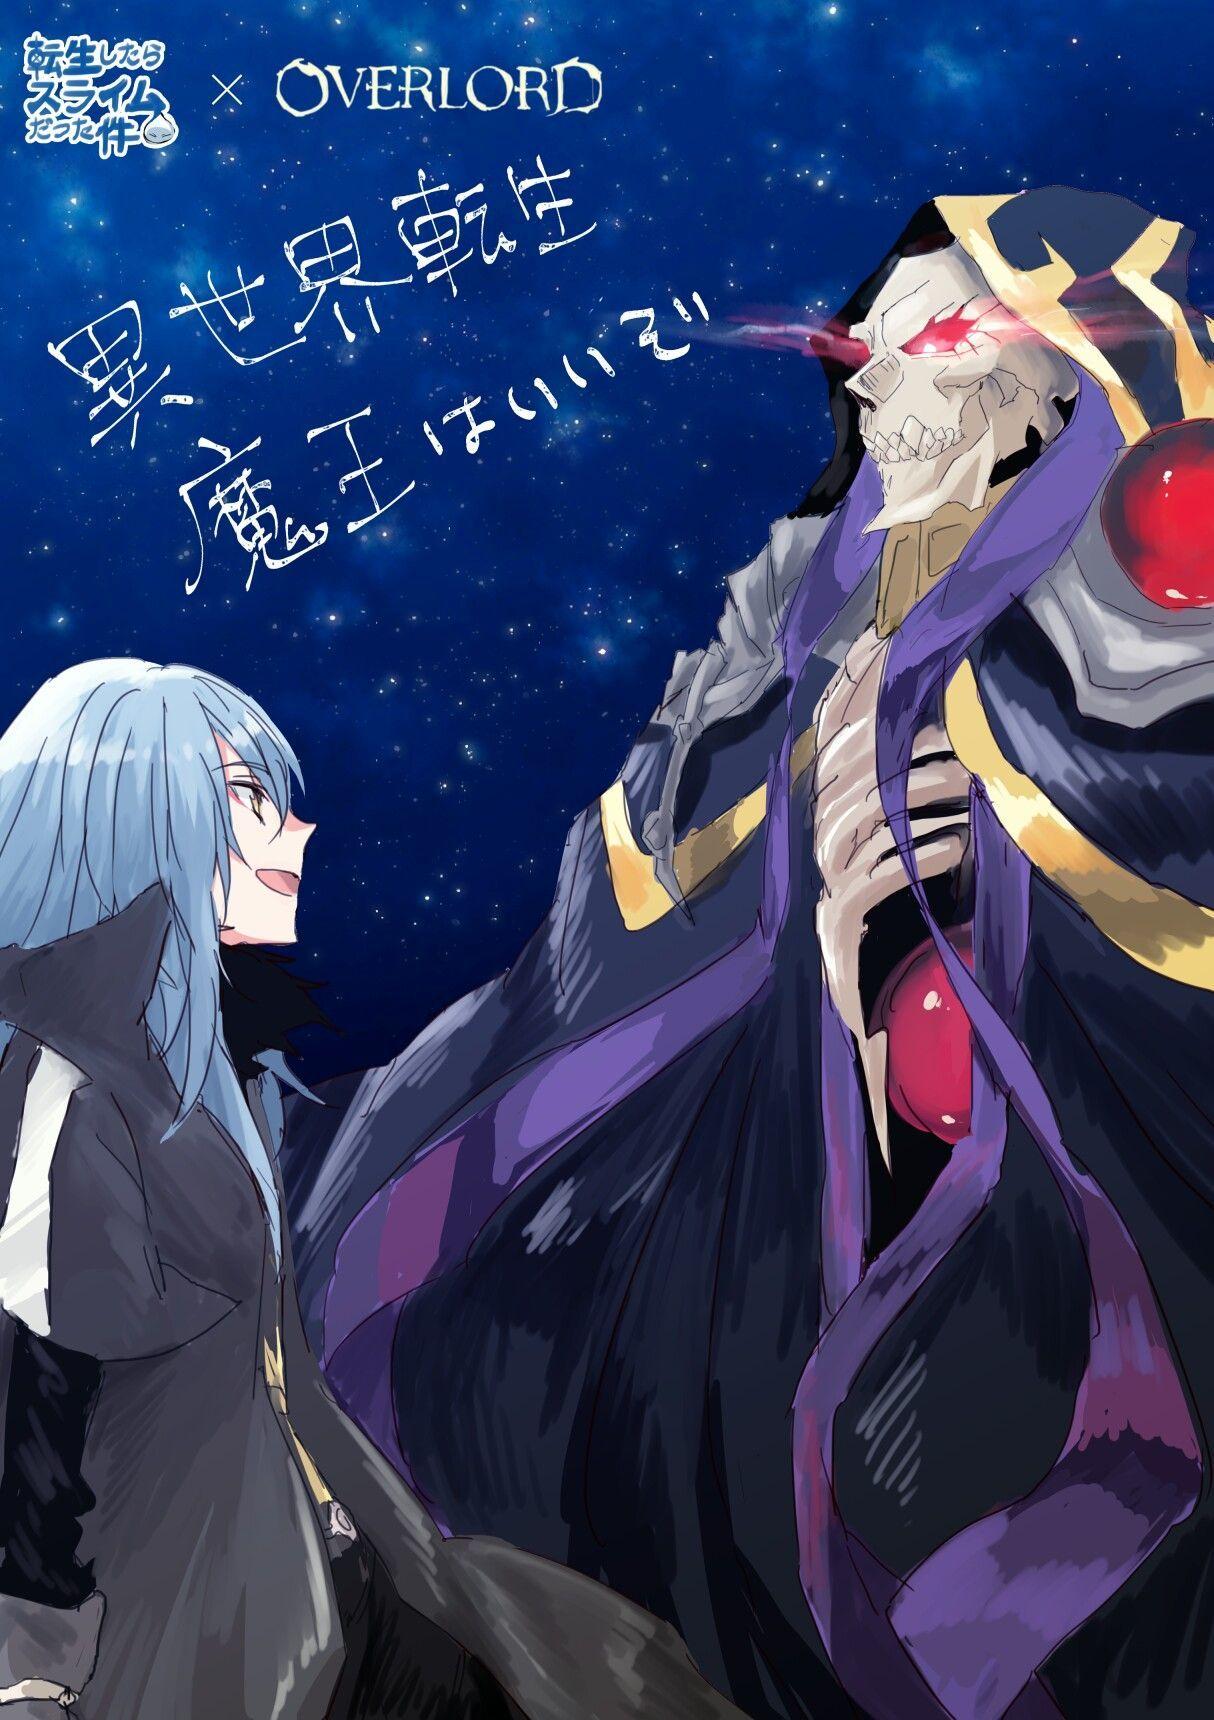 "#Rimuru #Anime #Overlord ""Rimuru Tempest"" Is The New Name"